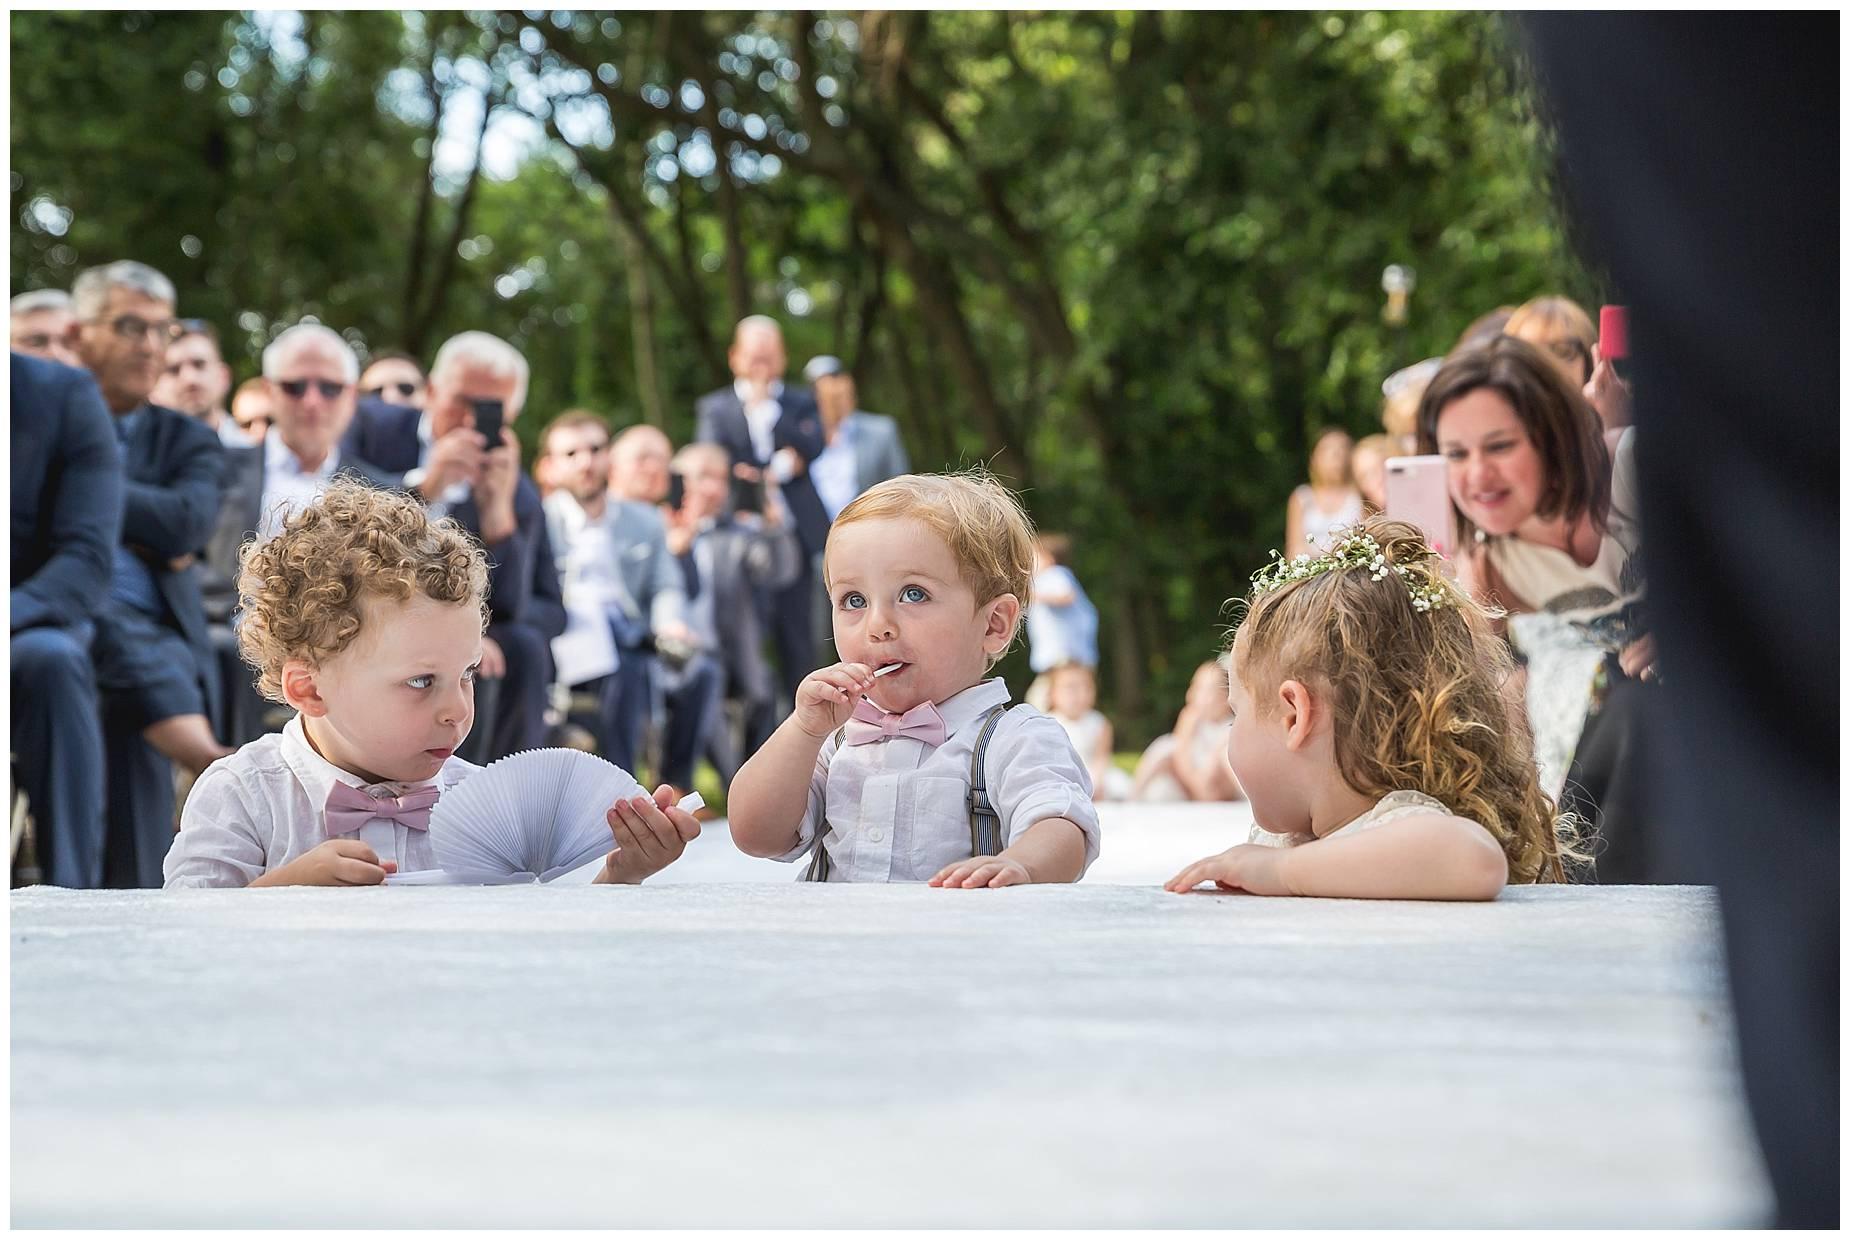 kids watching wedding ceremony